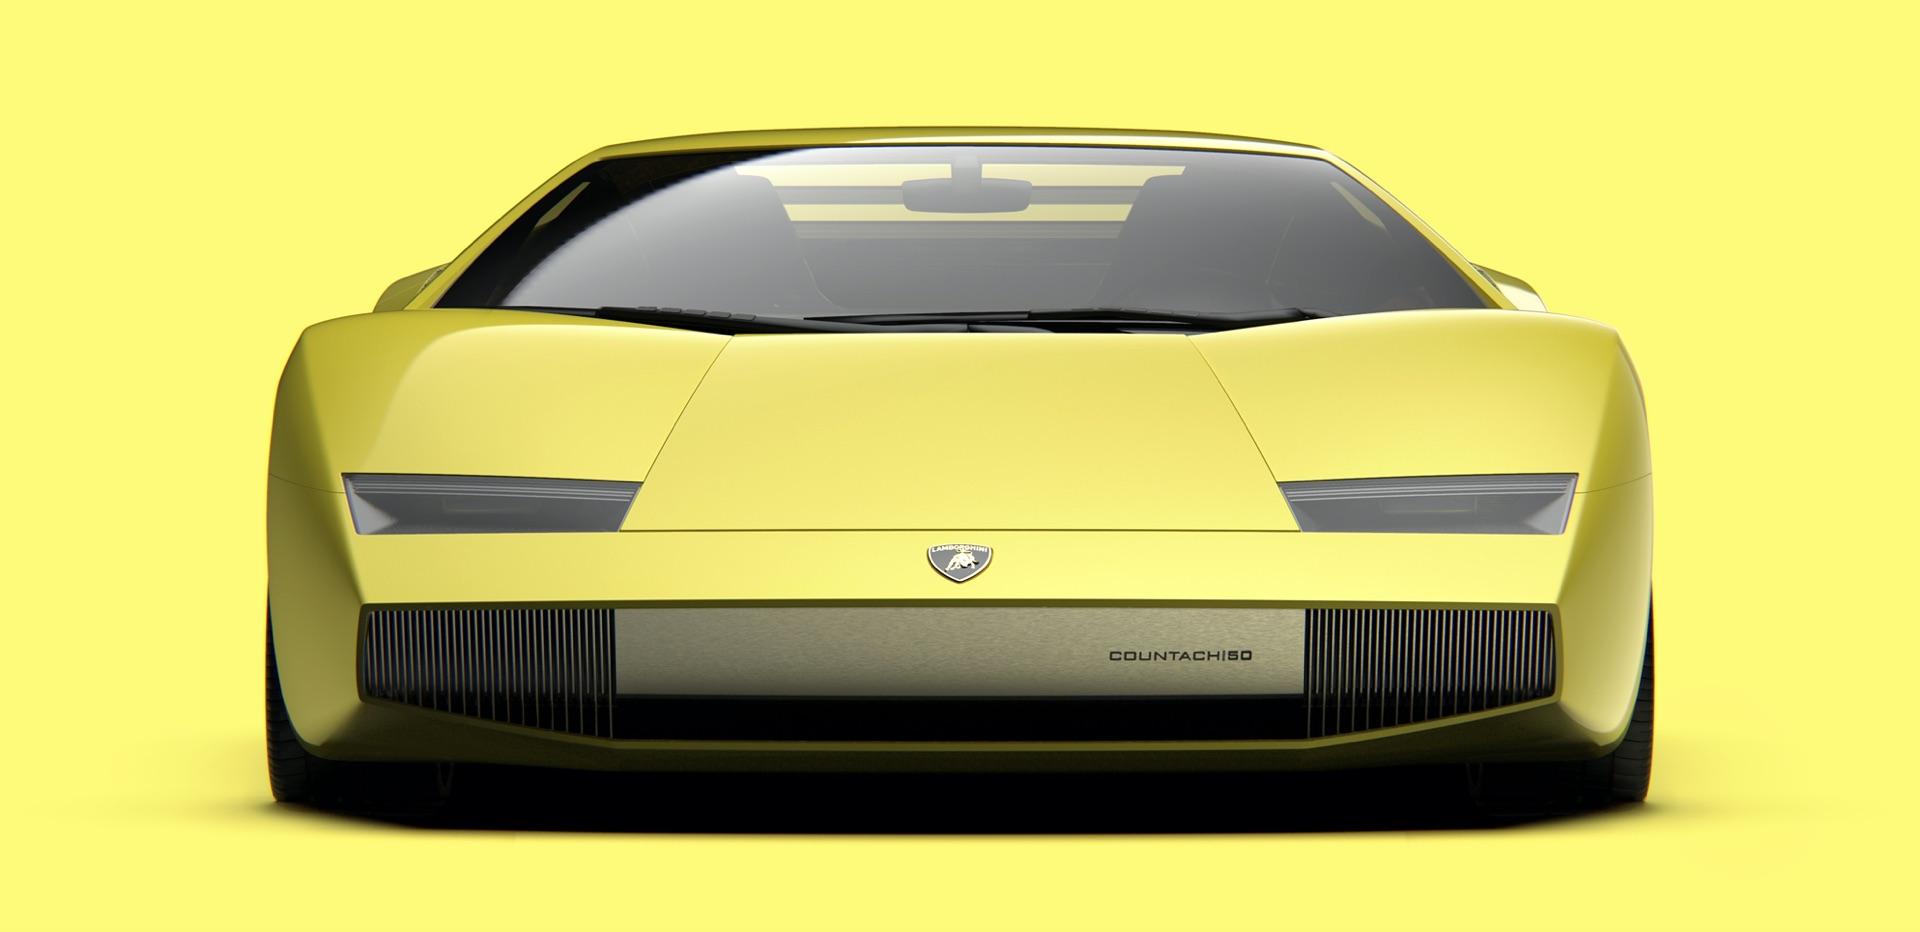 Lamborghini-Countach-50-renderings25